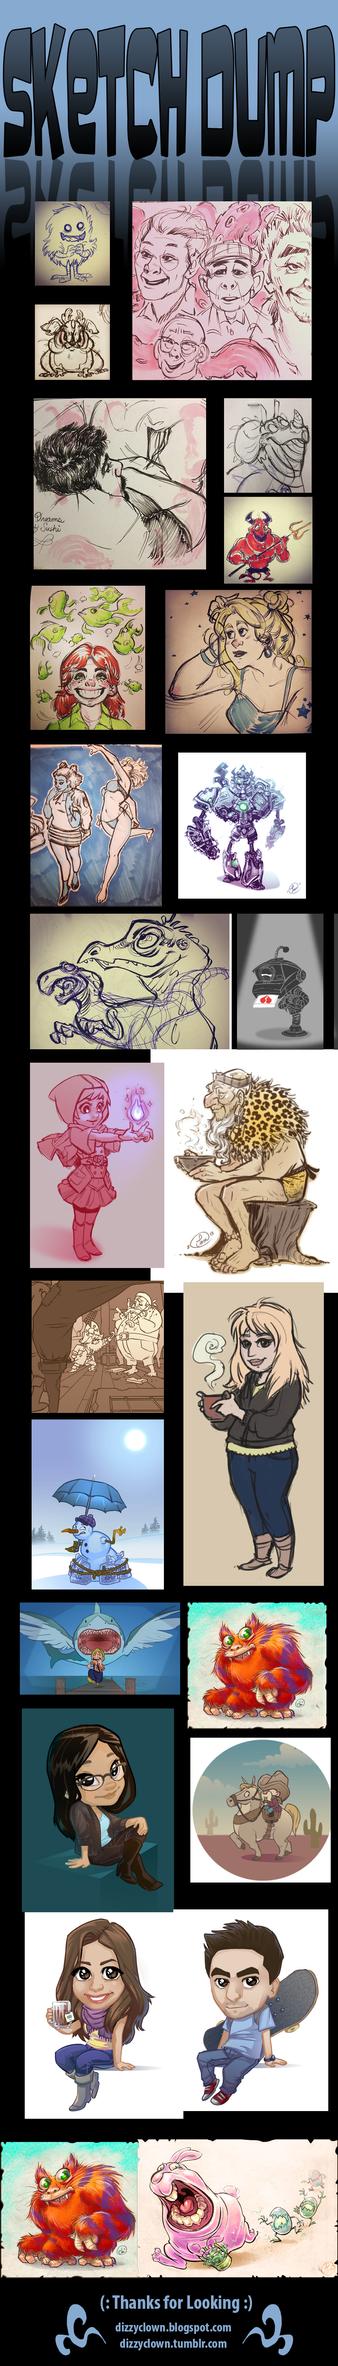 Sketch Dump No. ??? by dizzyclown